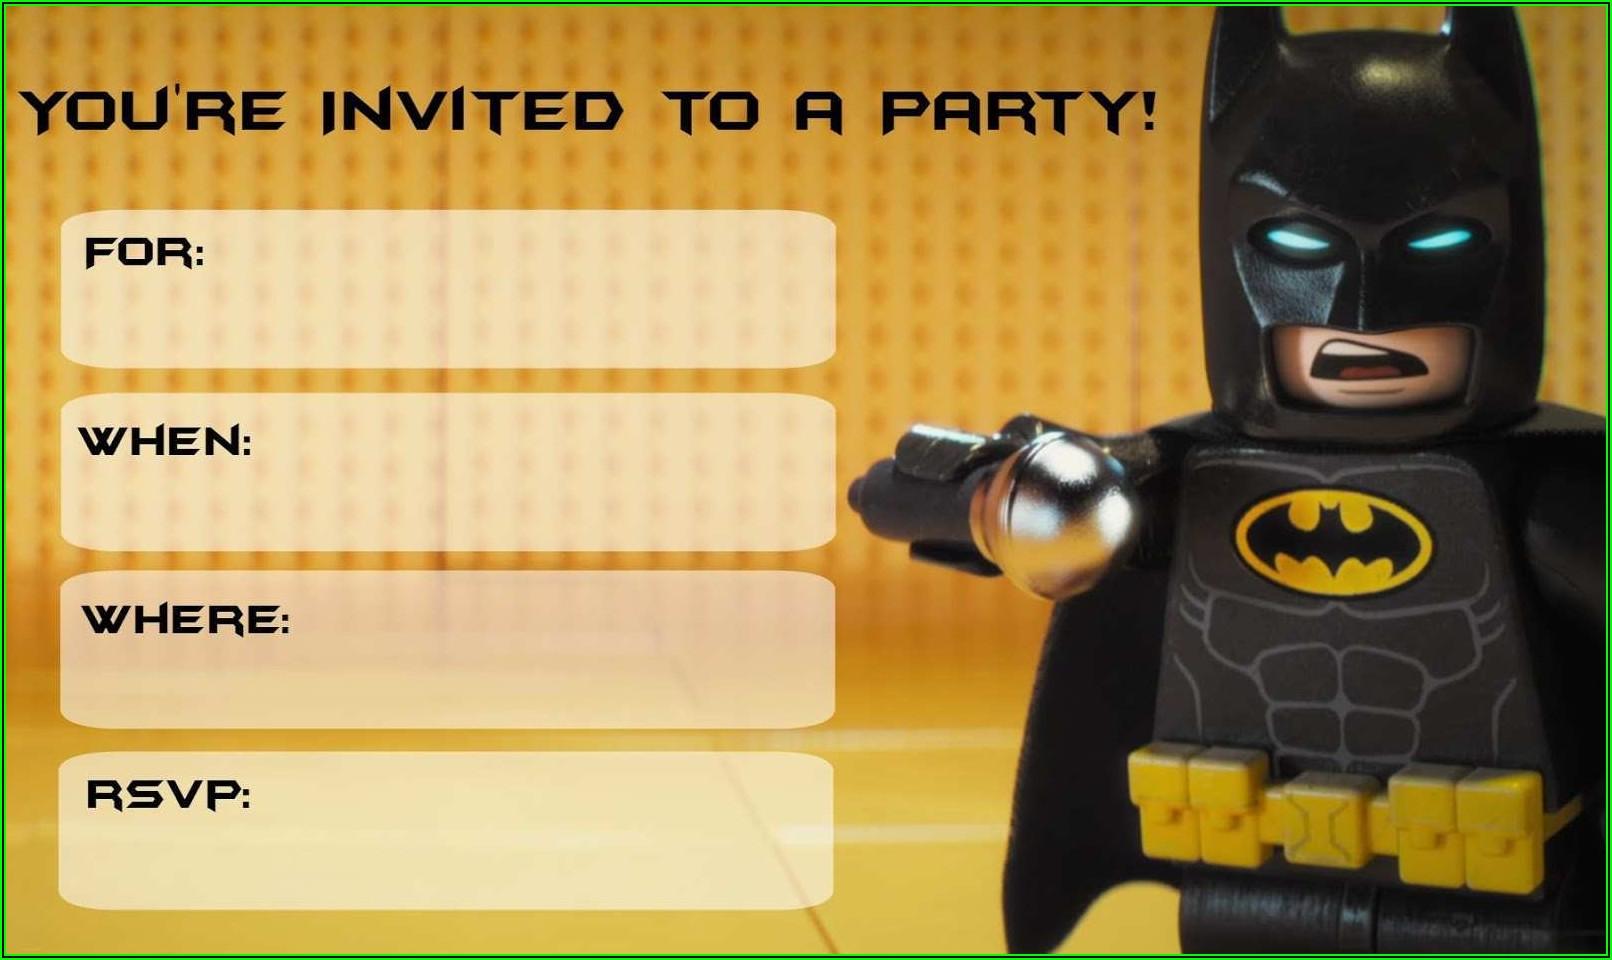 Party Invitation Photo Templates Free